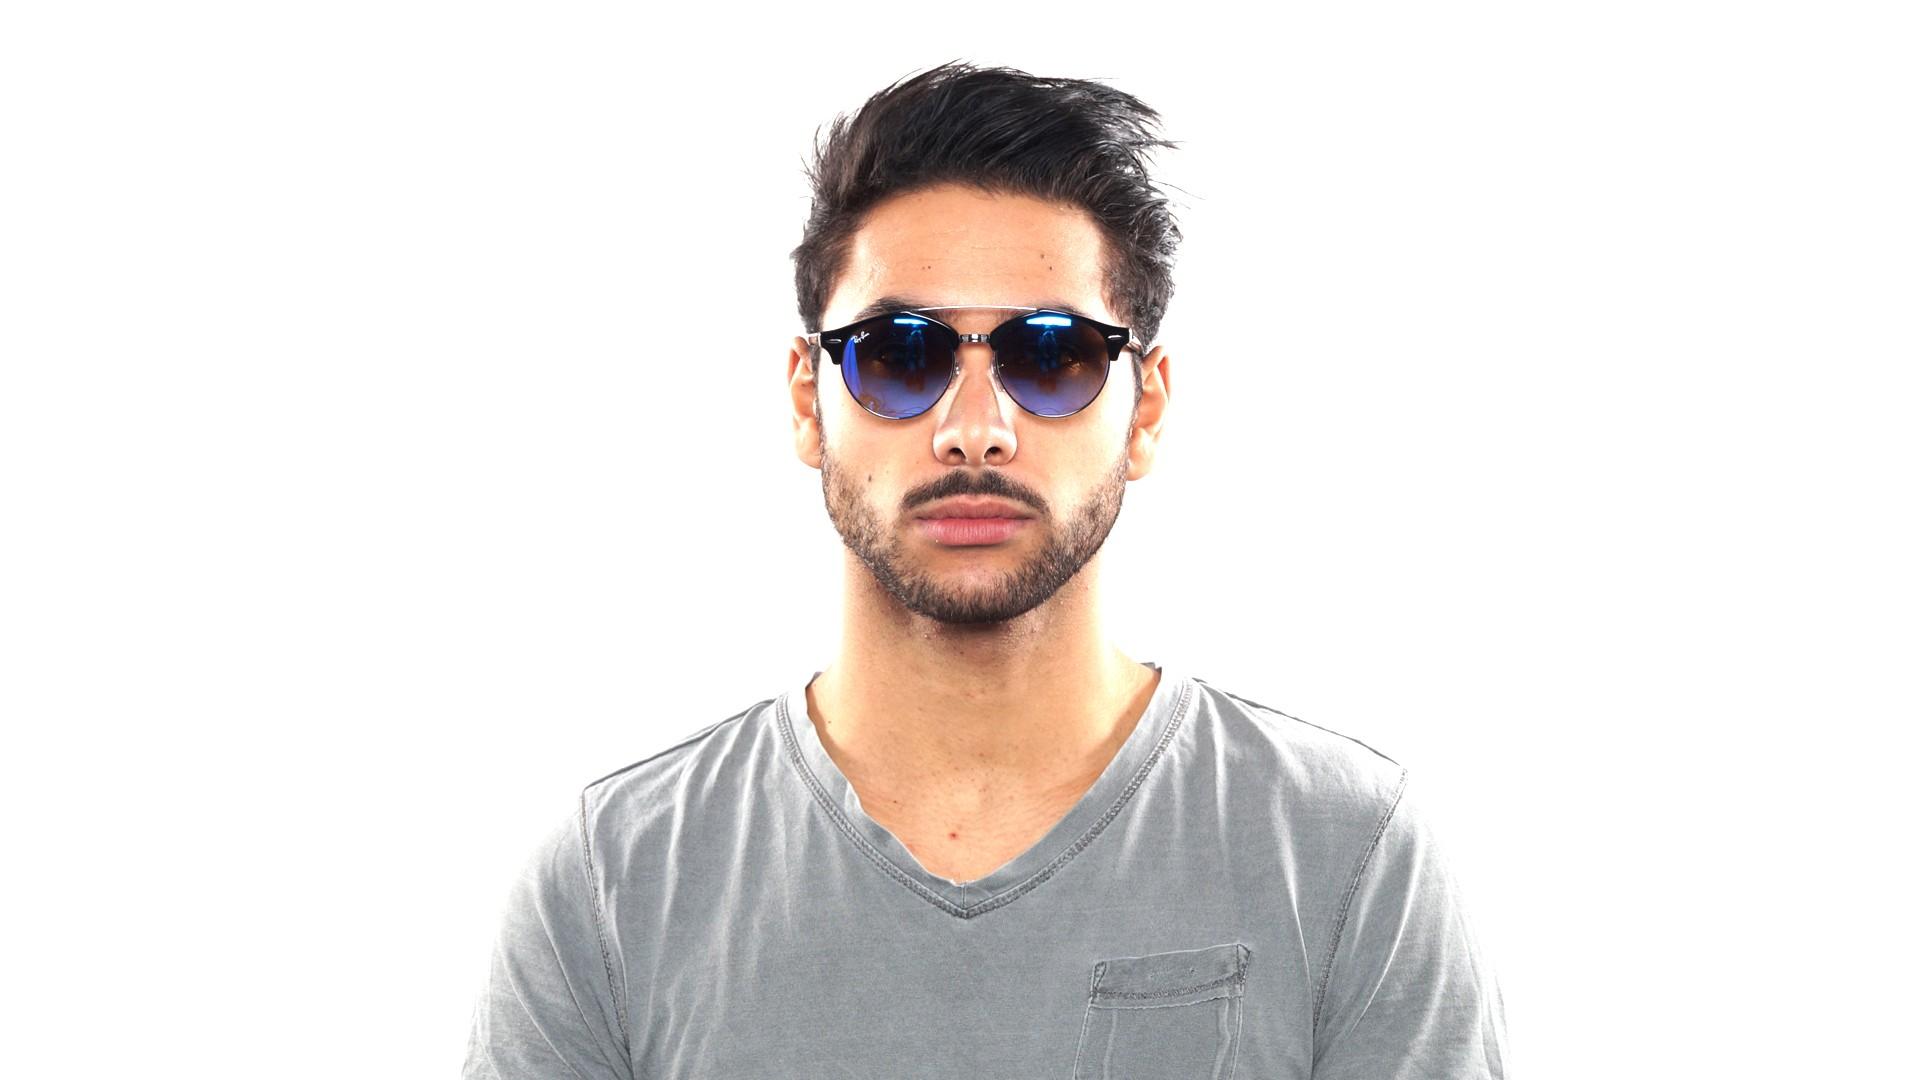 Sunglasses Ray-Ban Clubround double bridge Black RB4346 62507Q 51-19 Medium  Gradient Mirror 3817f73c06d4